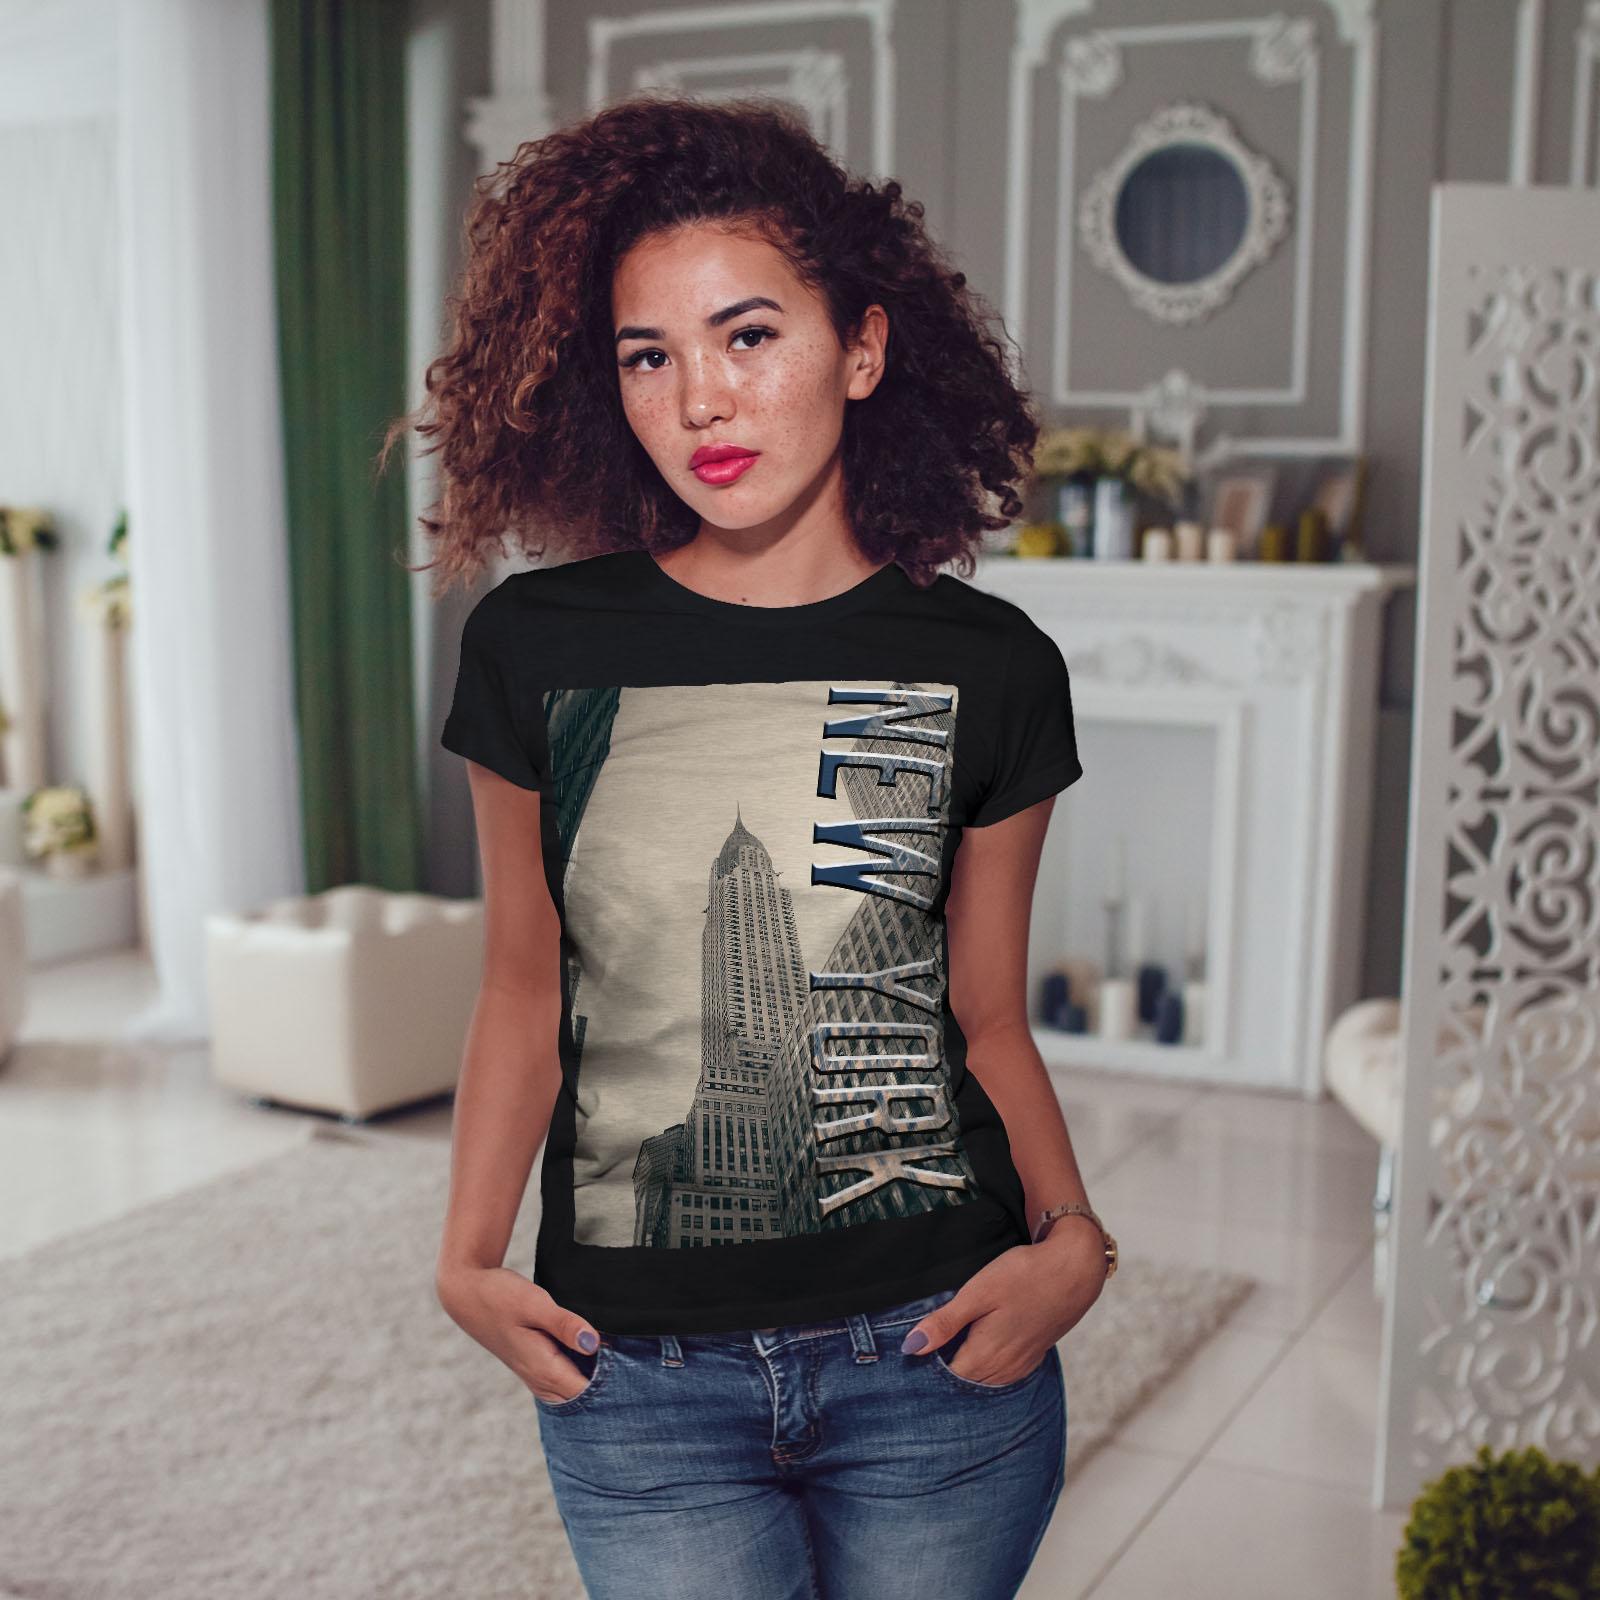 Wellcoda City Fashion New Womens T-shirt Building Casual Design Printed Tee